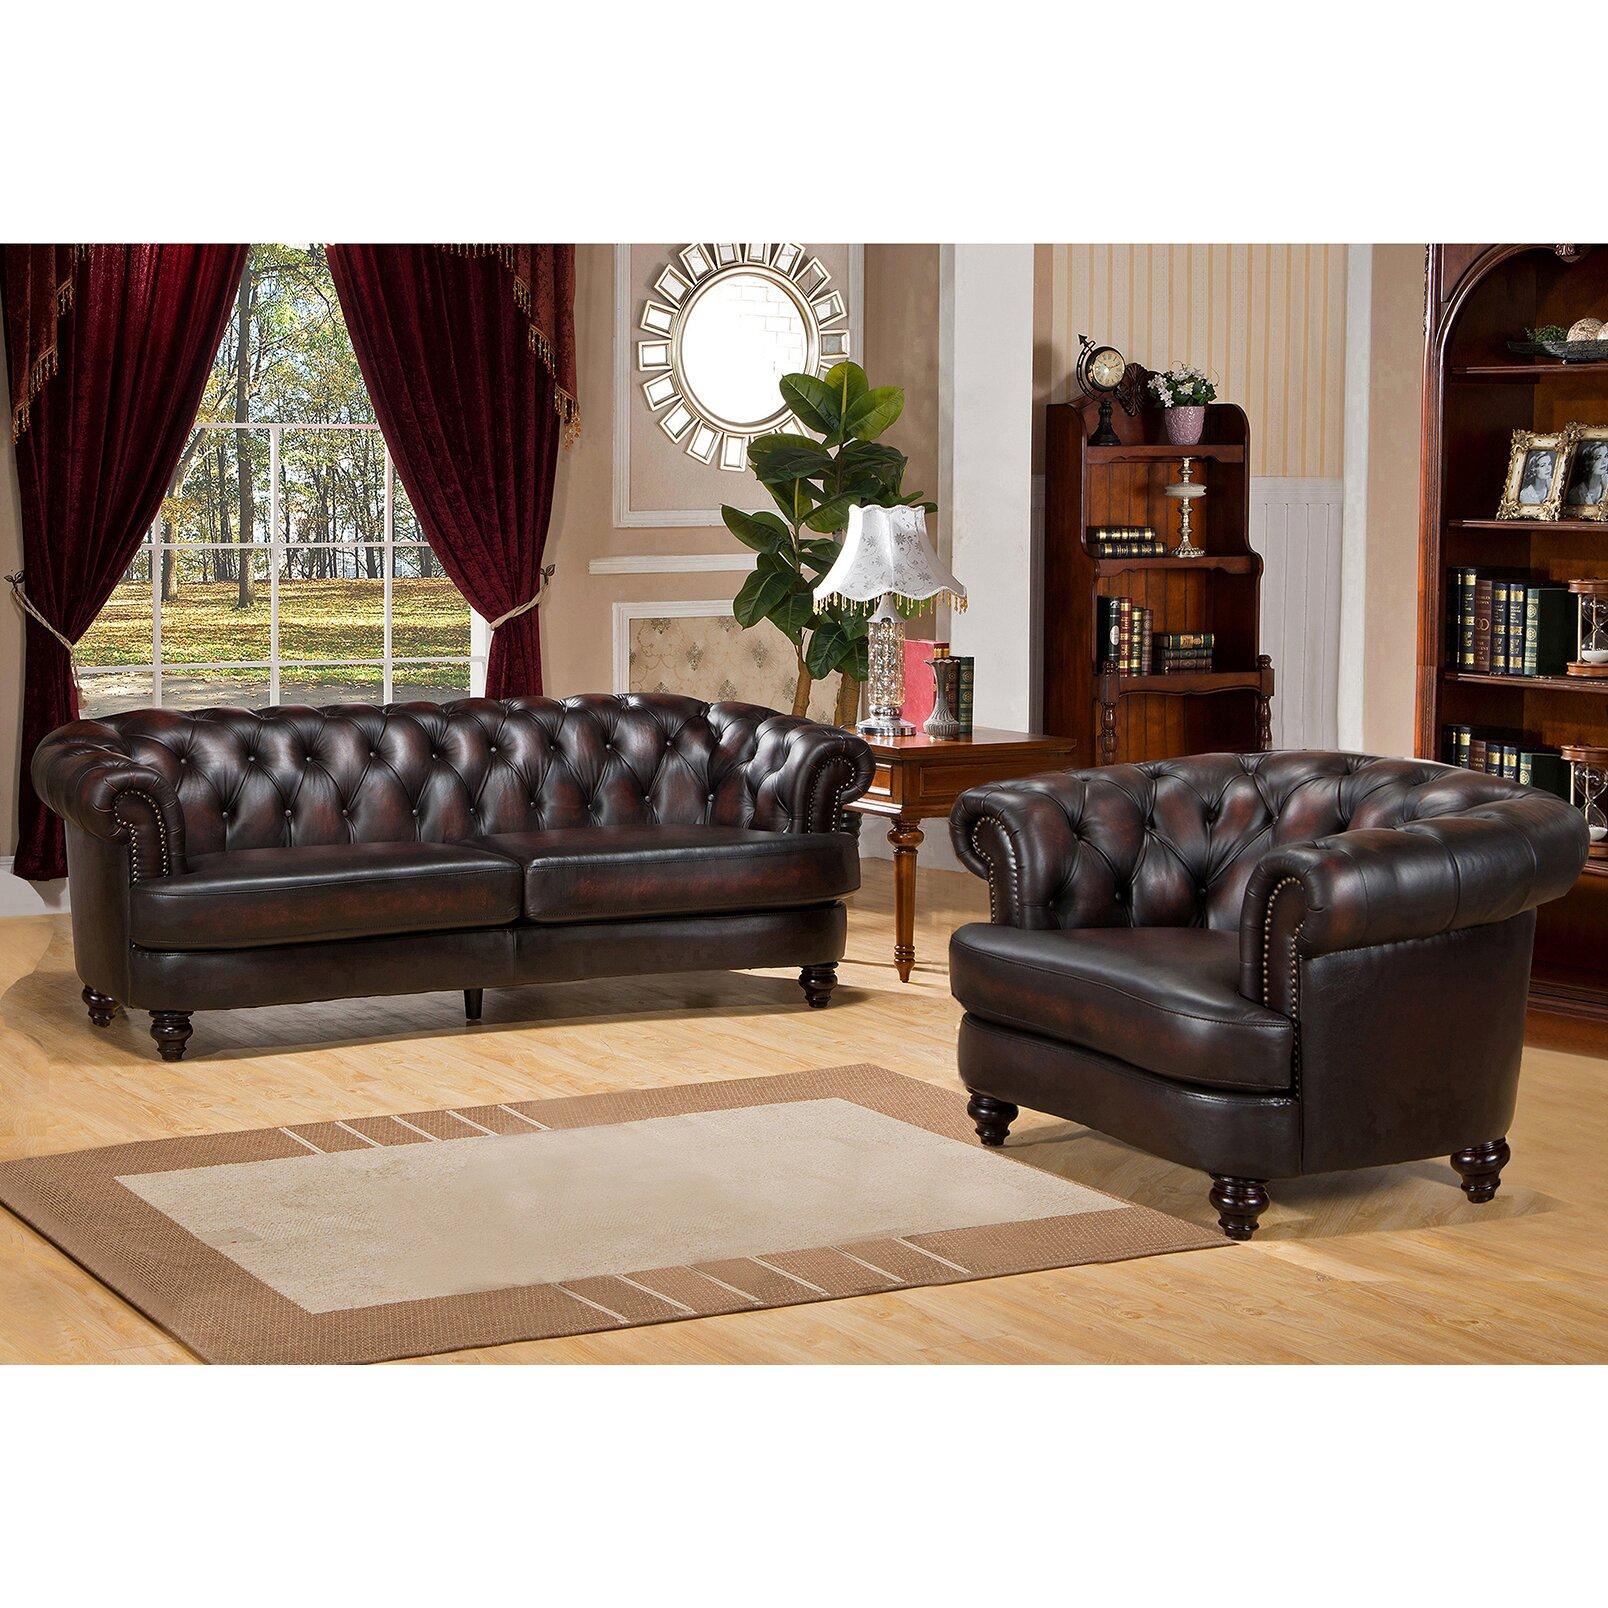 Amax roosevelt 2 piece leather living room set 2 piece leather living room set